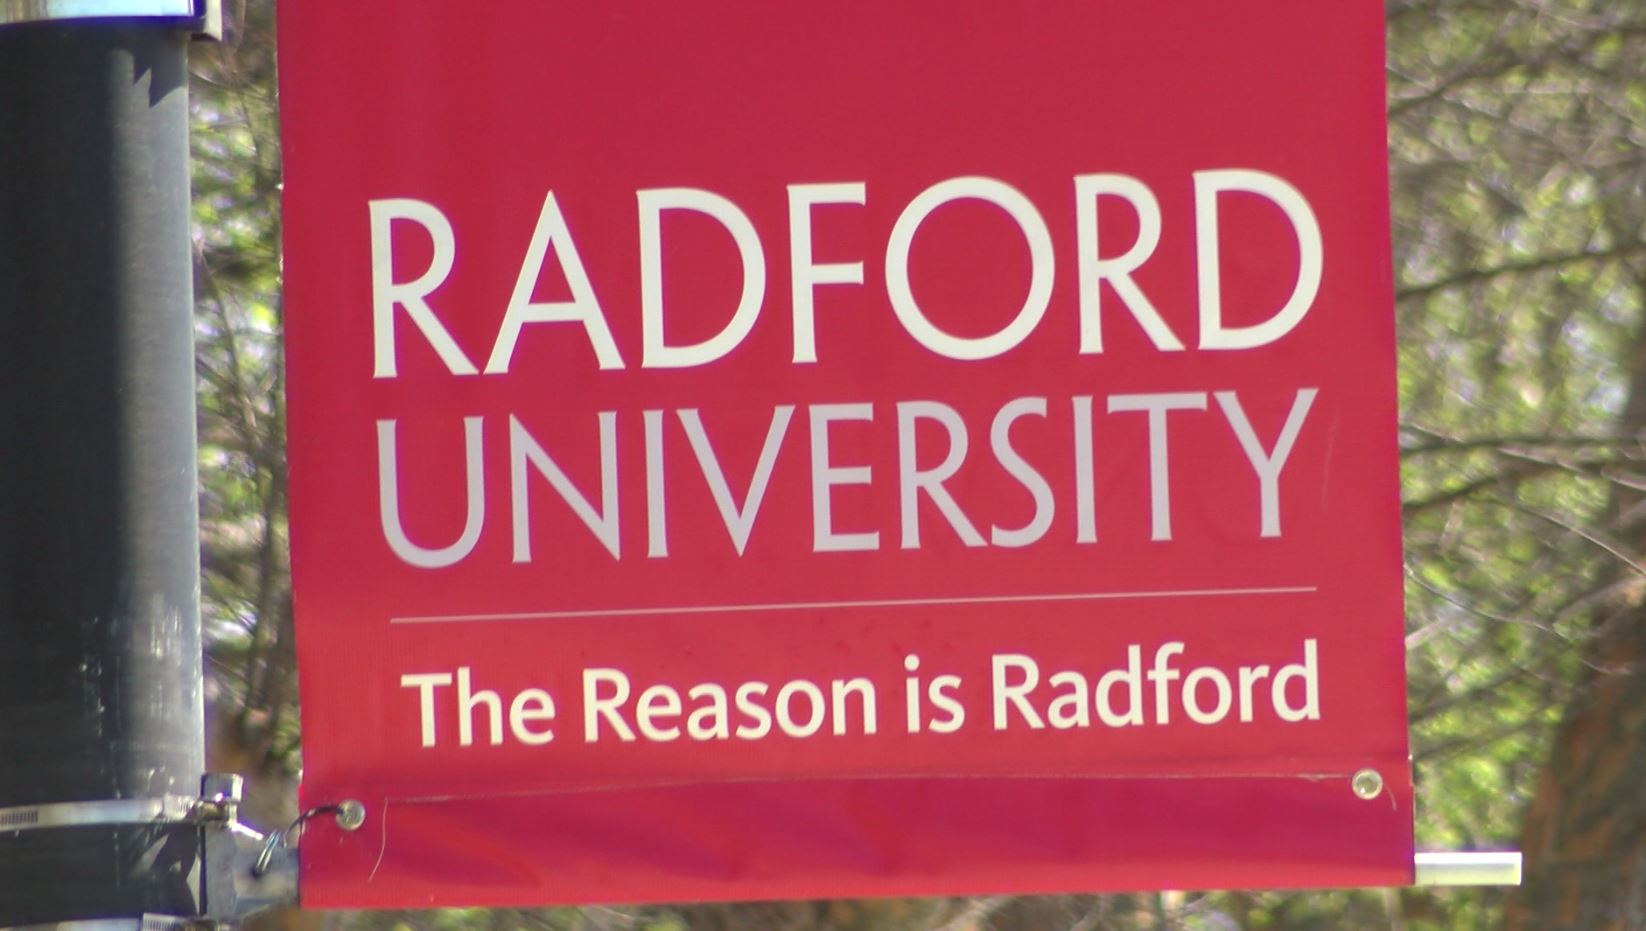 radford_1512596400142.JPG